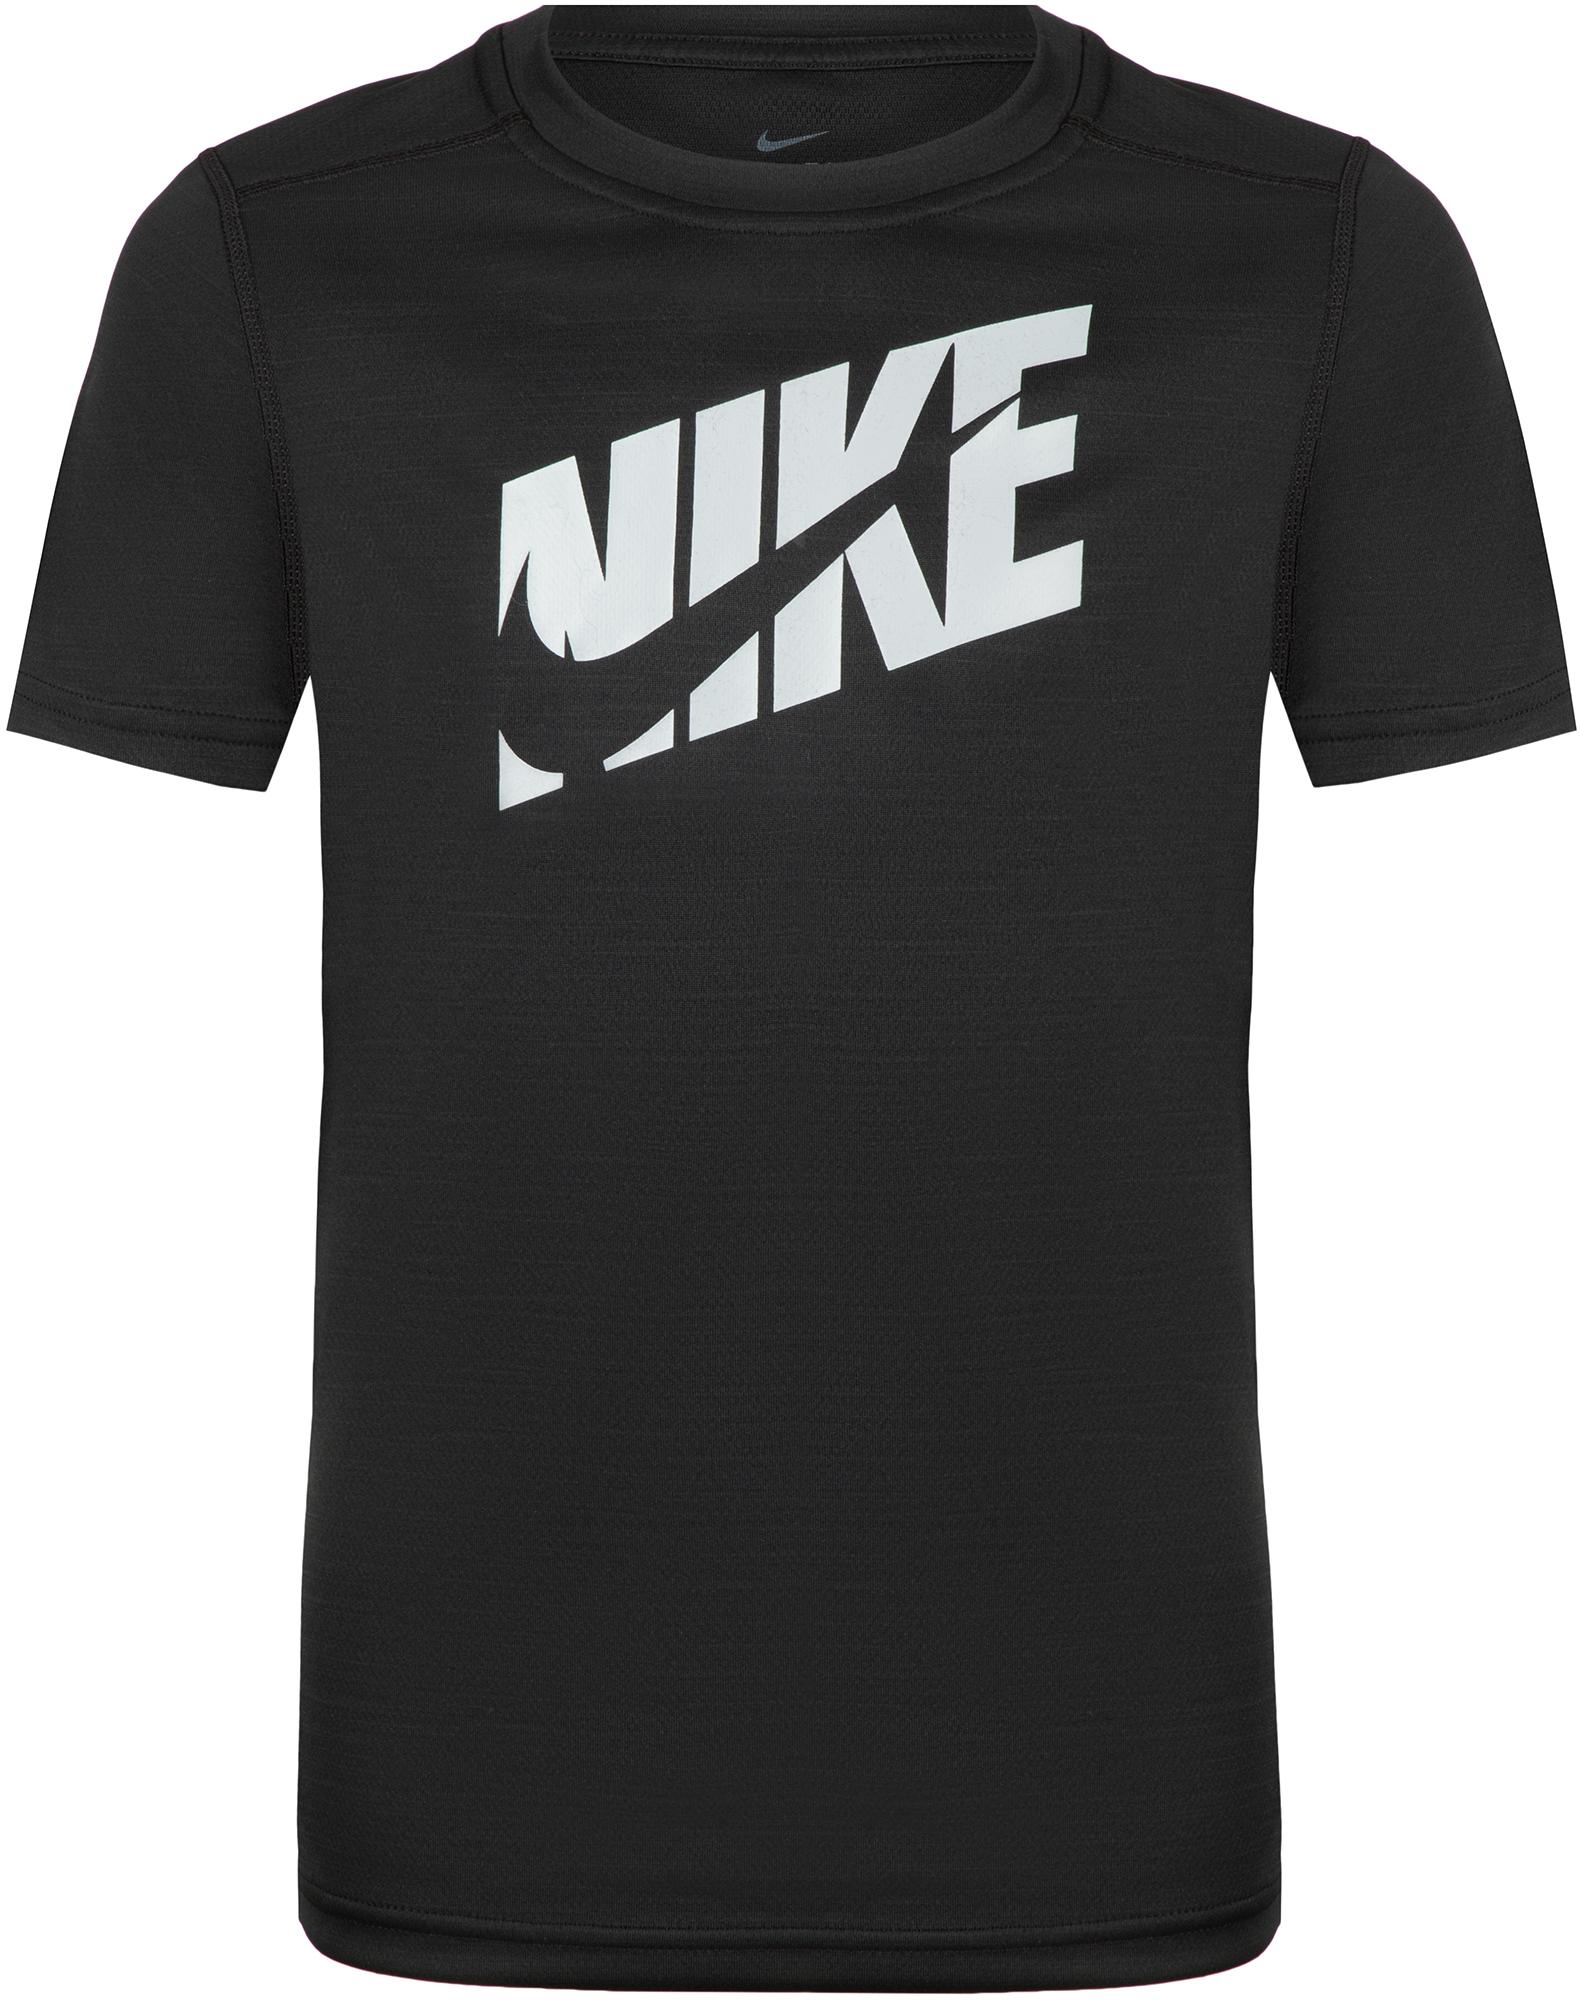 Nike Футболка для мальчиков Nike, размер 158-170 nike футболка для мальчиков nike geo basketball